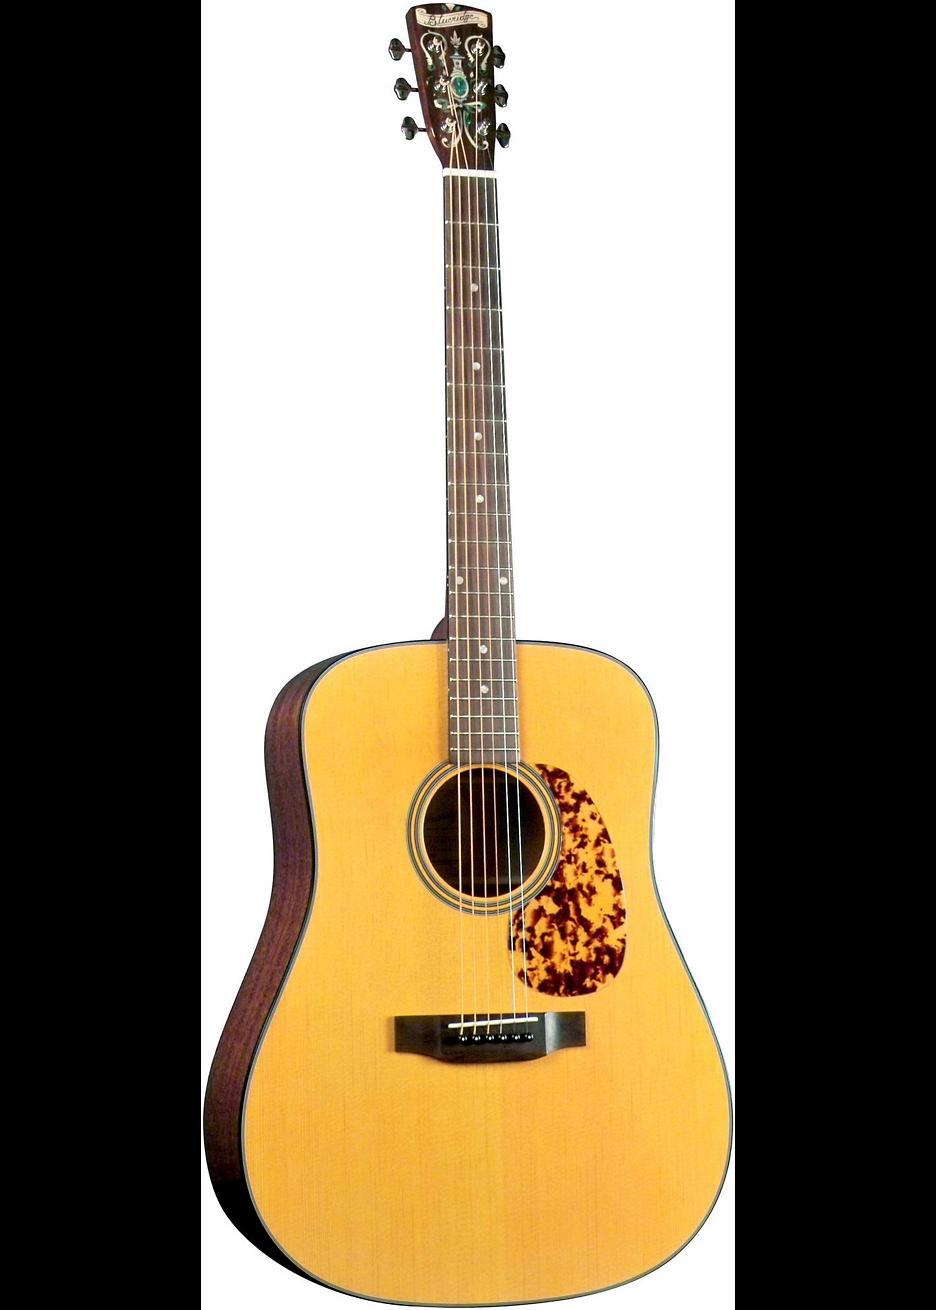 blueridge br 140 historic series dreadnought acoustic guitar. Black Bedroom Furniture Sets. Home Design Ideas